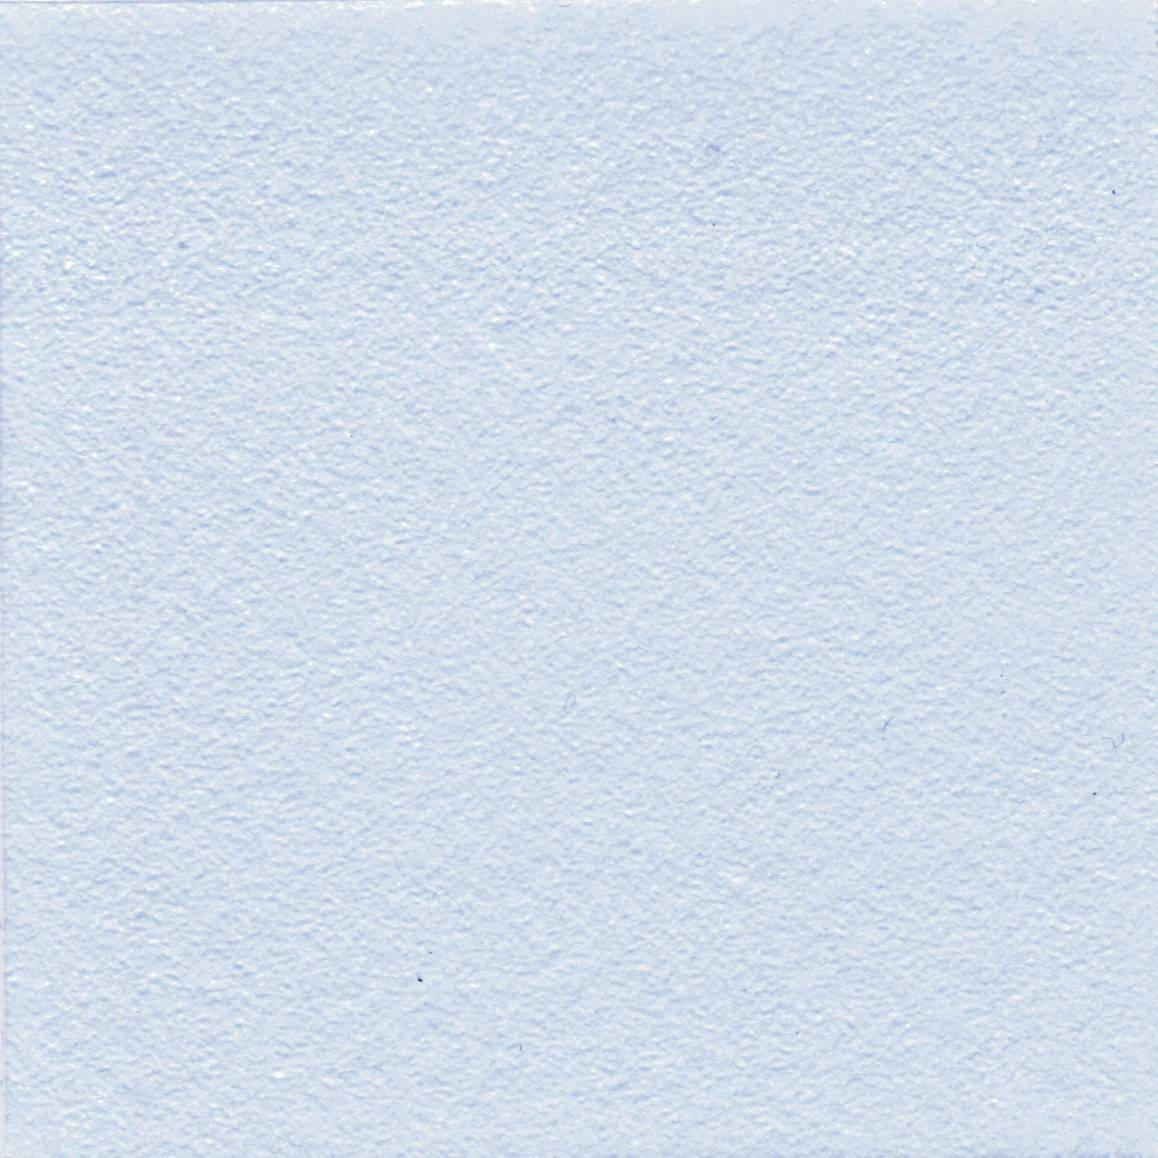 Teplovodivá fólie Kerafol 86/300, 50 x 50 x 3 mm, modrá